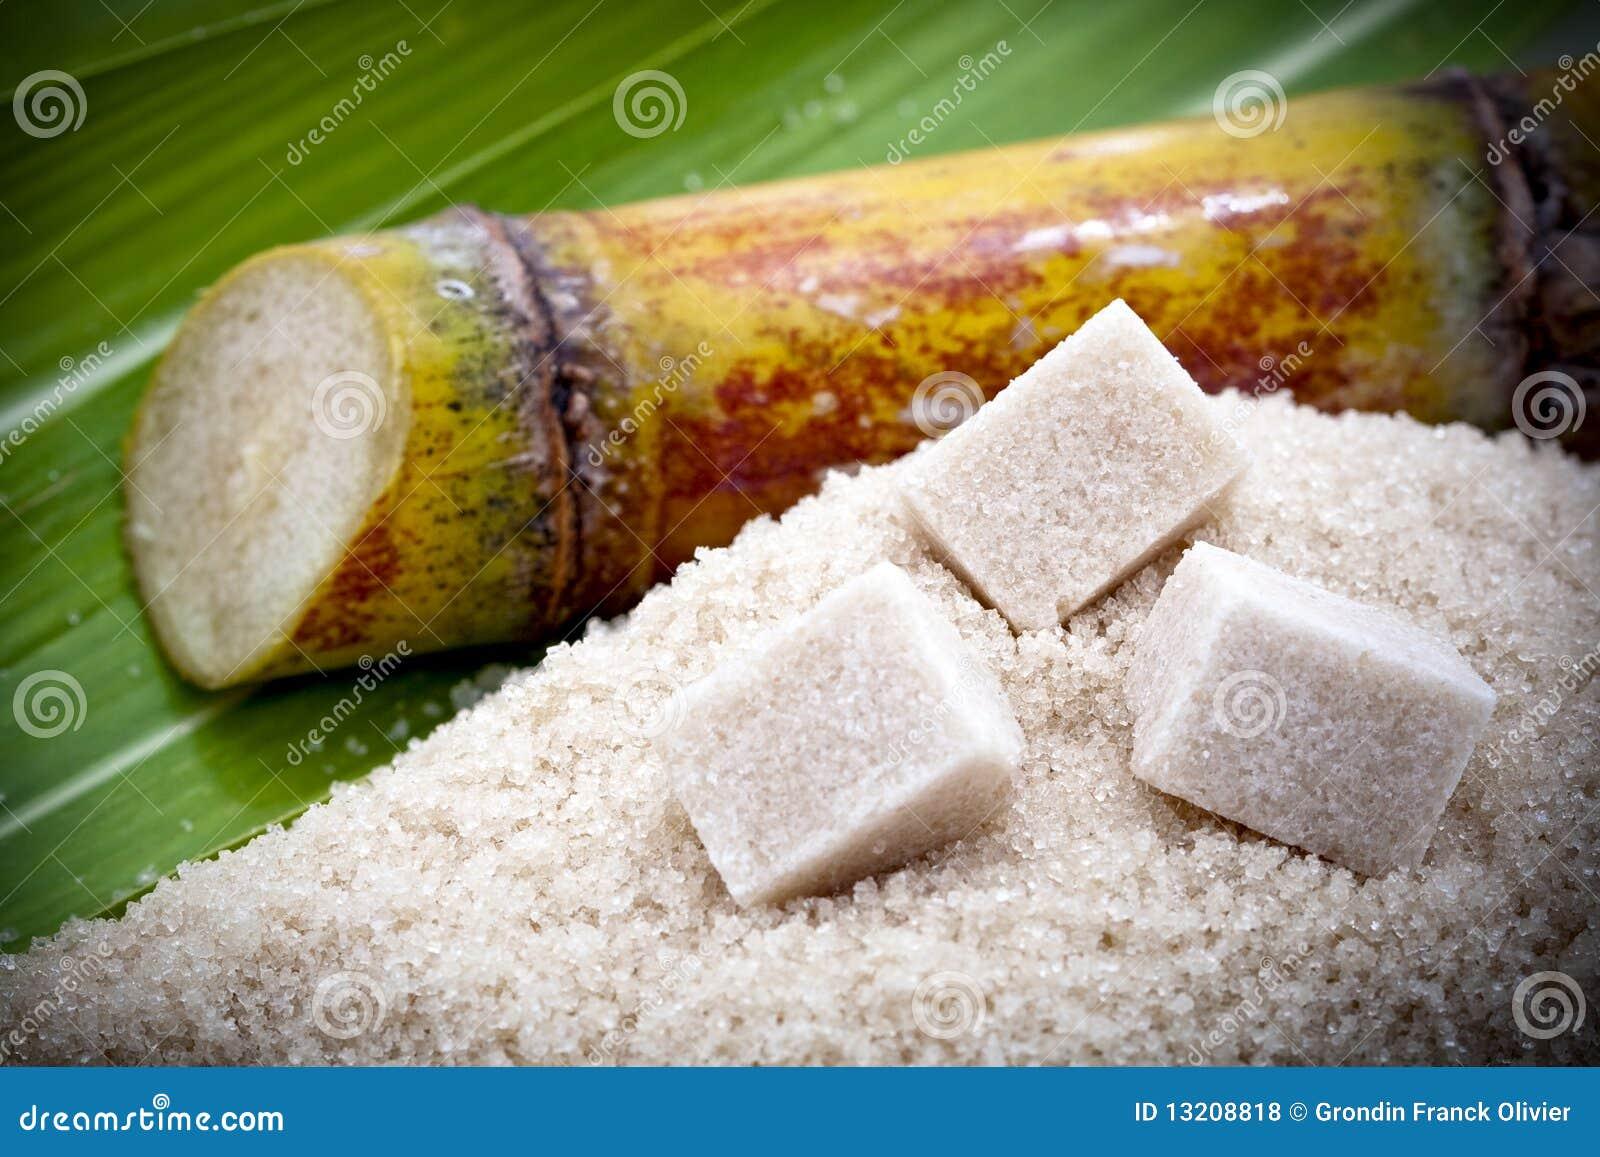 Cut Sugarcane Plant Royalty Free Stock Photos